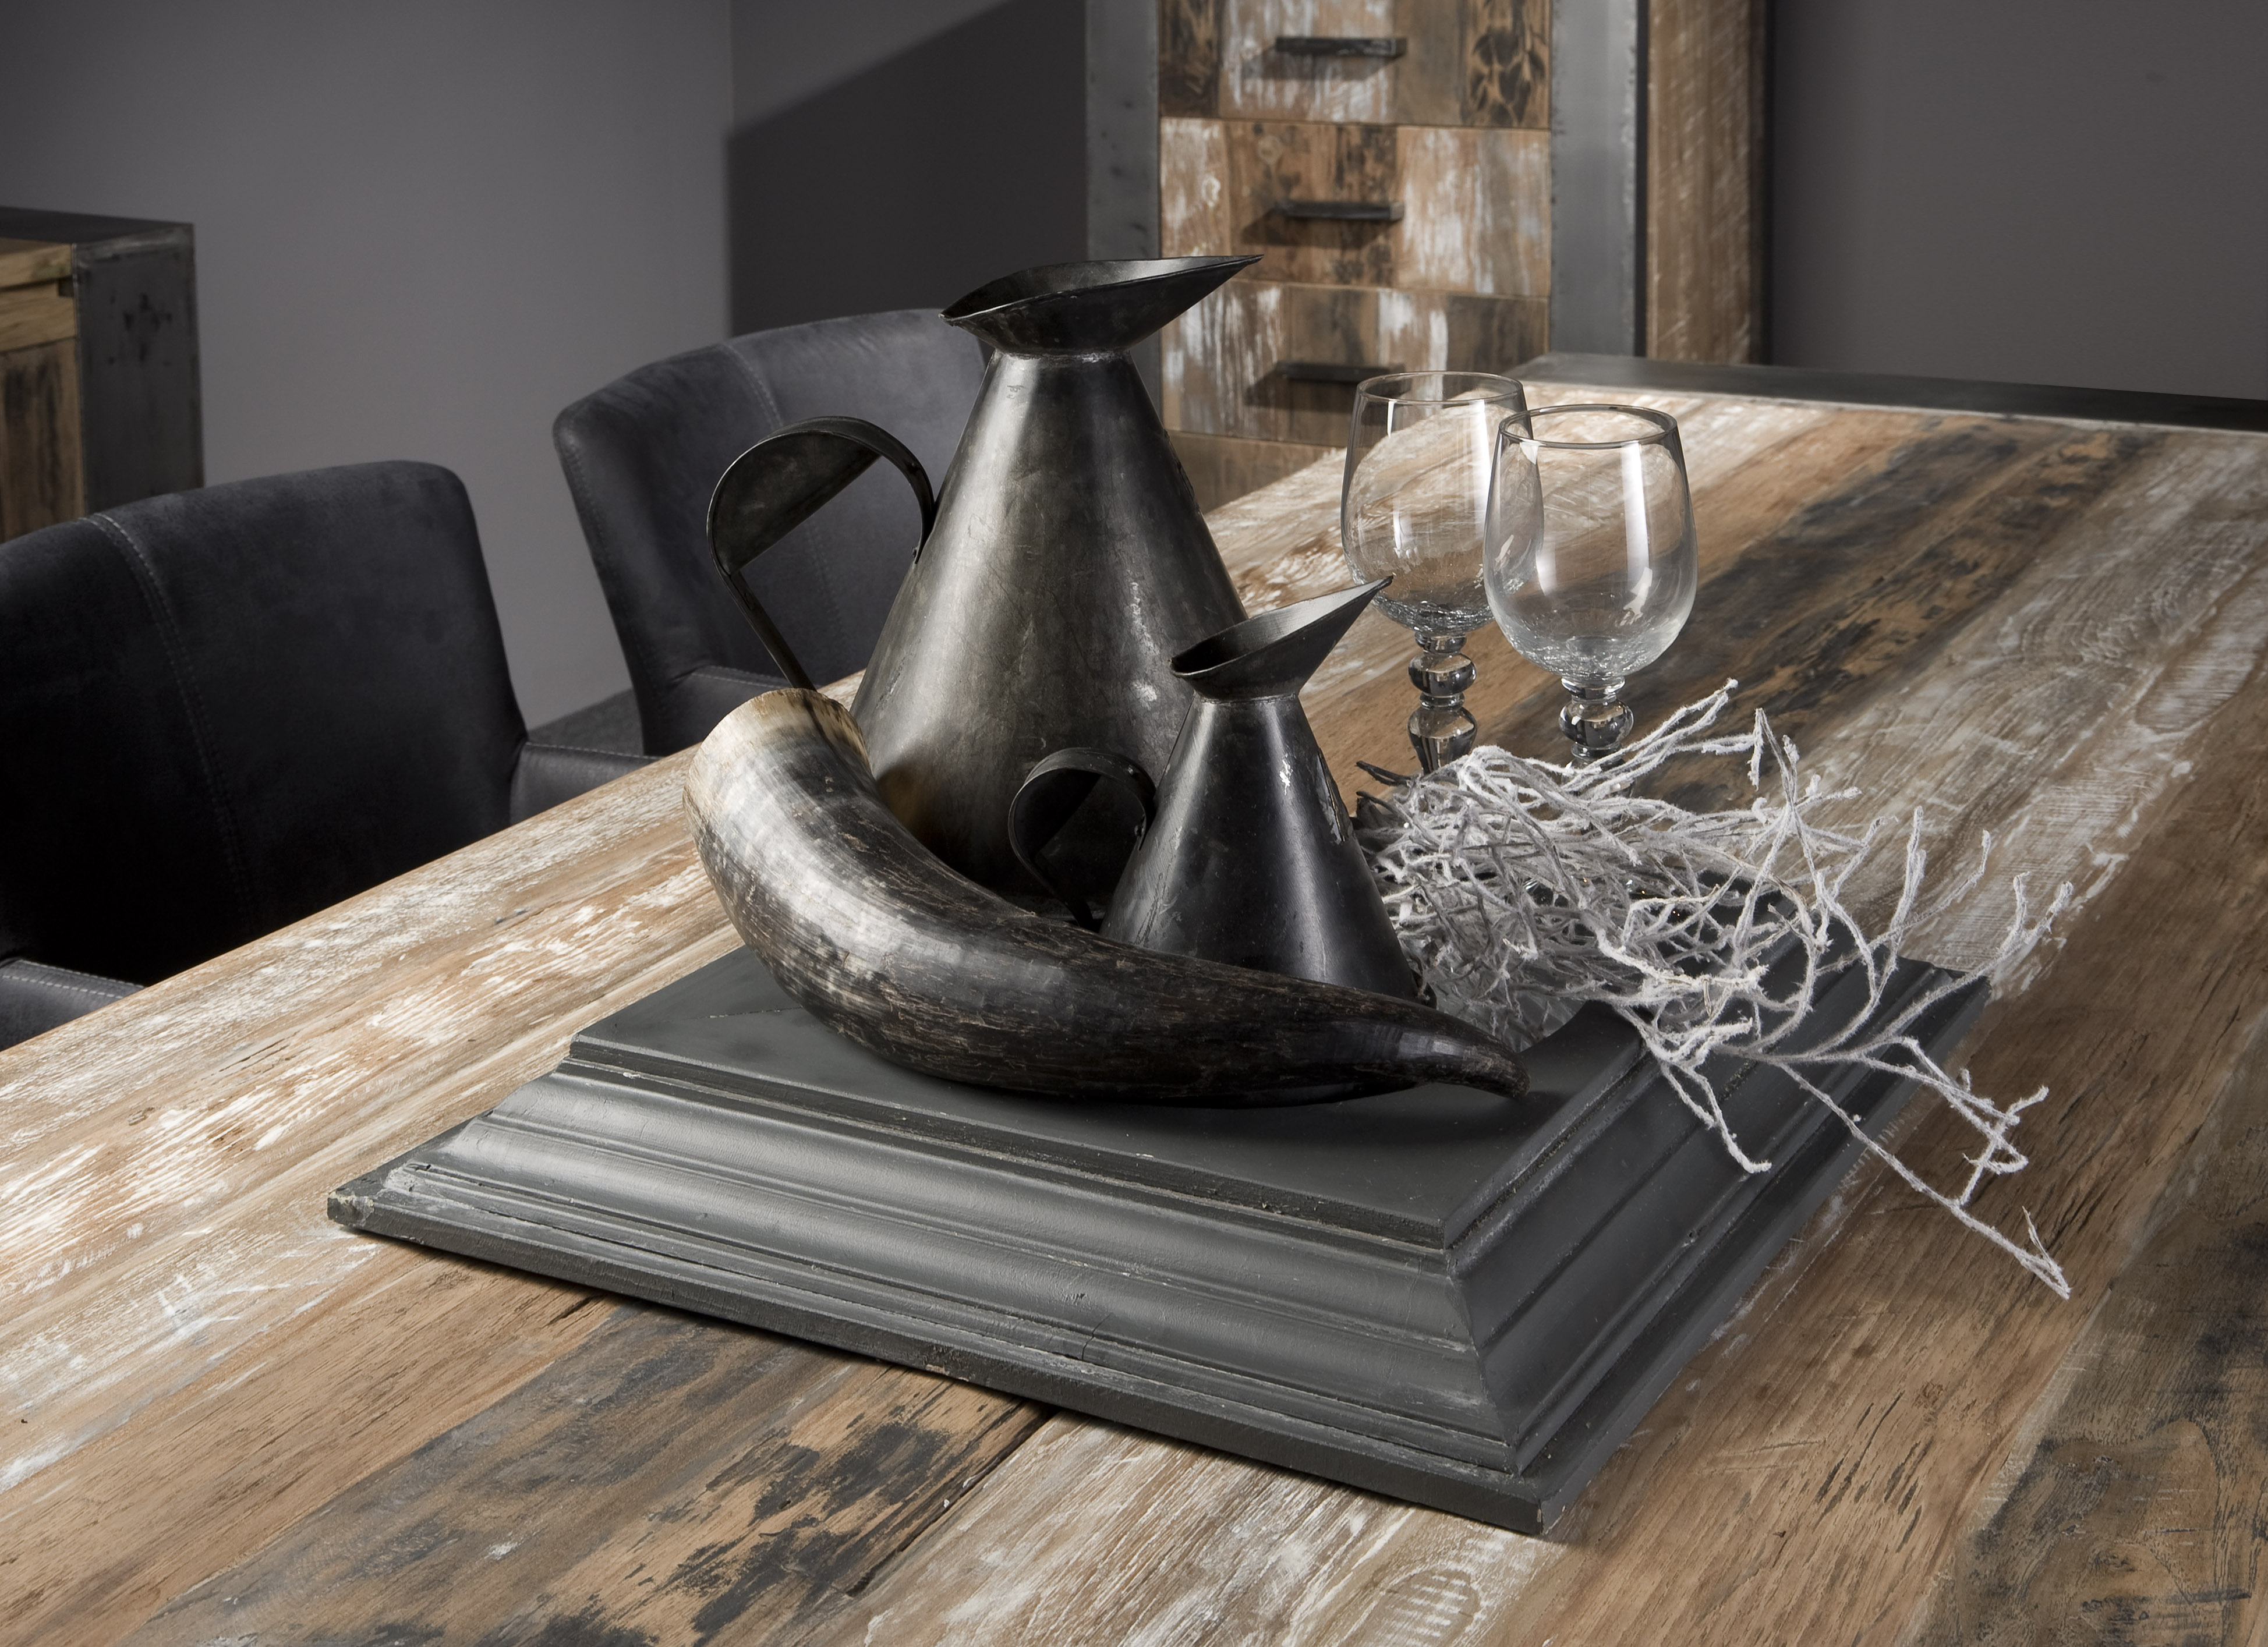 Woonkamer Set Hout : Moderne ontwerp houten meubels set houten sofa set woonkamer hout